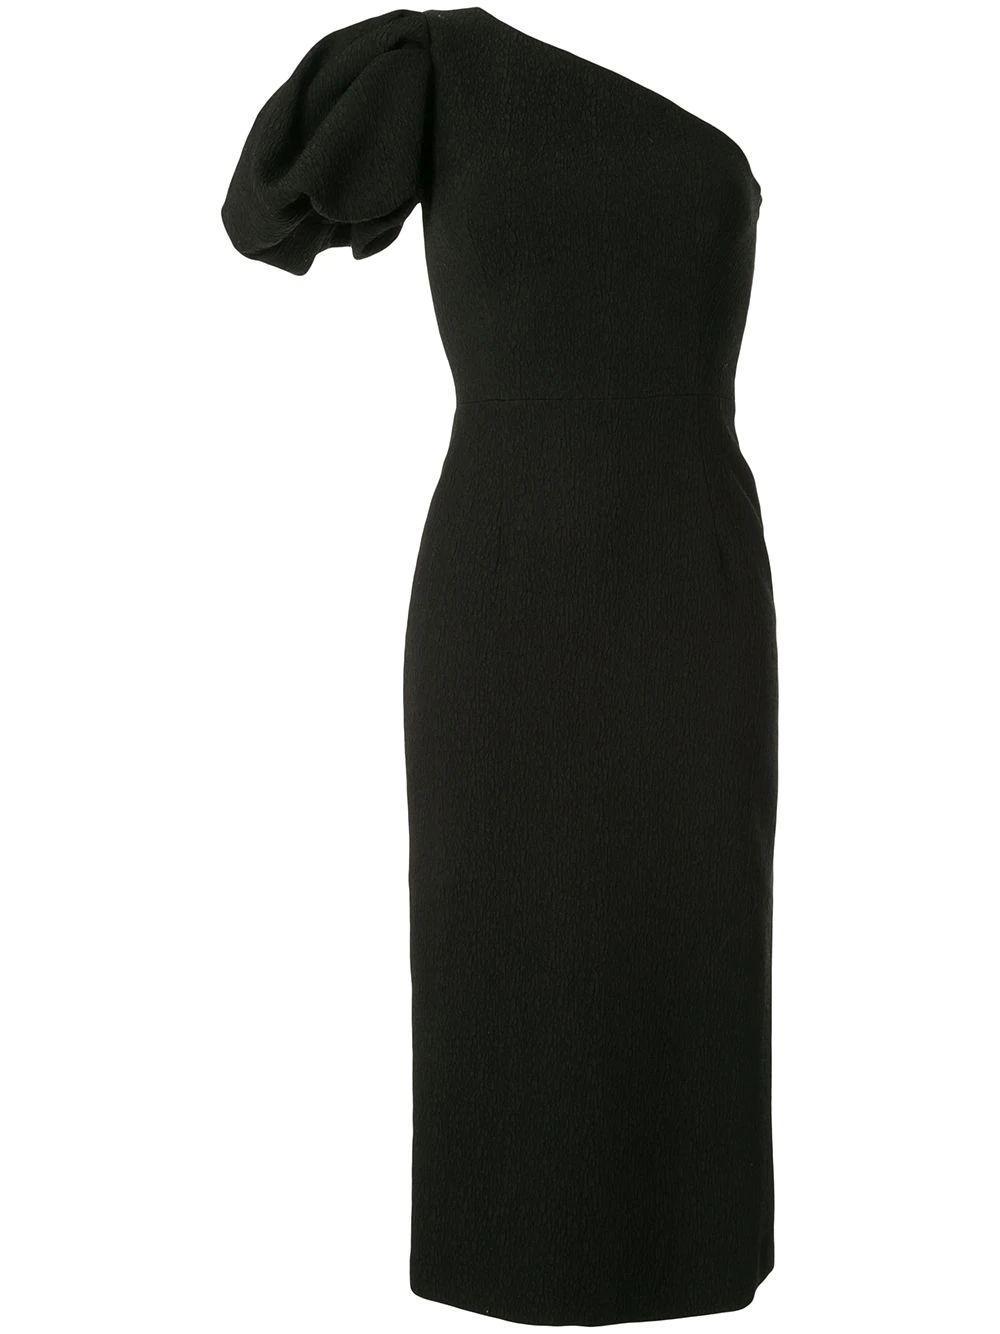 Natalia One Shoulder Midi Dress Item # 2001-1678